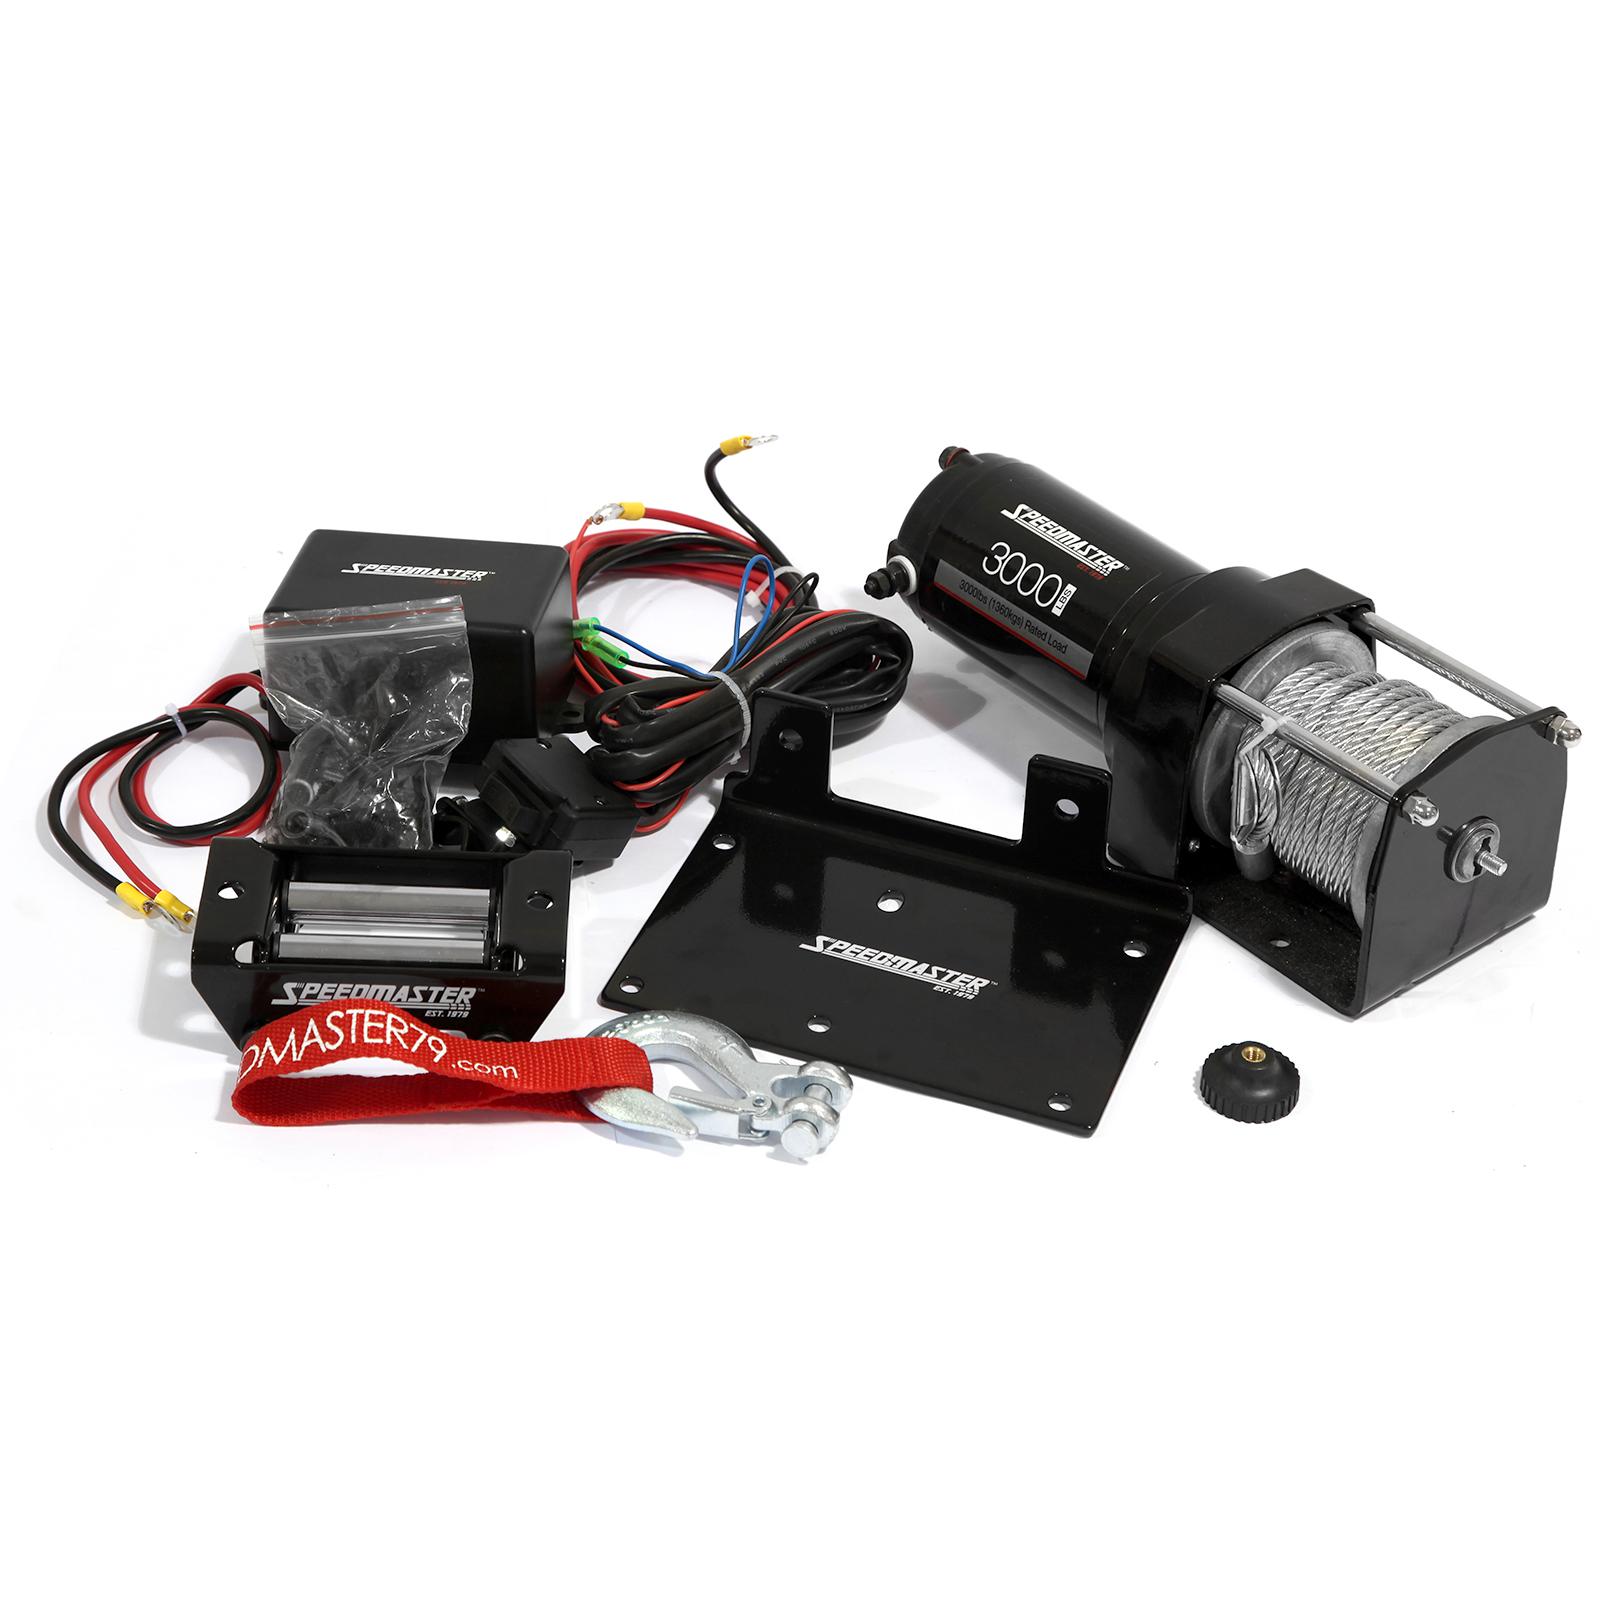 Speedmaster 3000lbs / 1360kgs 12V Electric ATV Winch Kit w/ Remote Switch